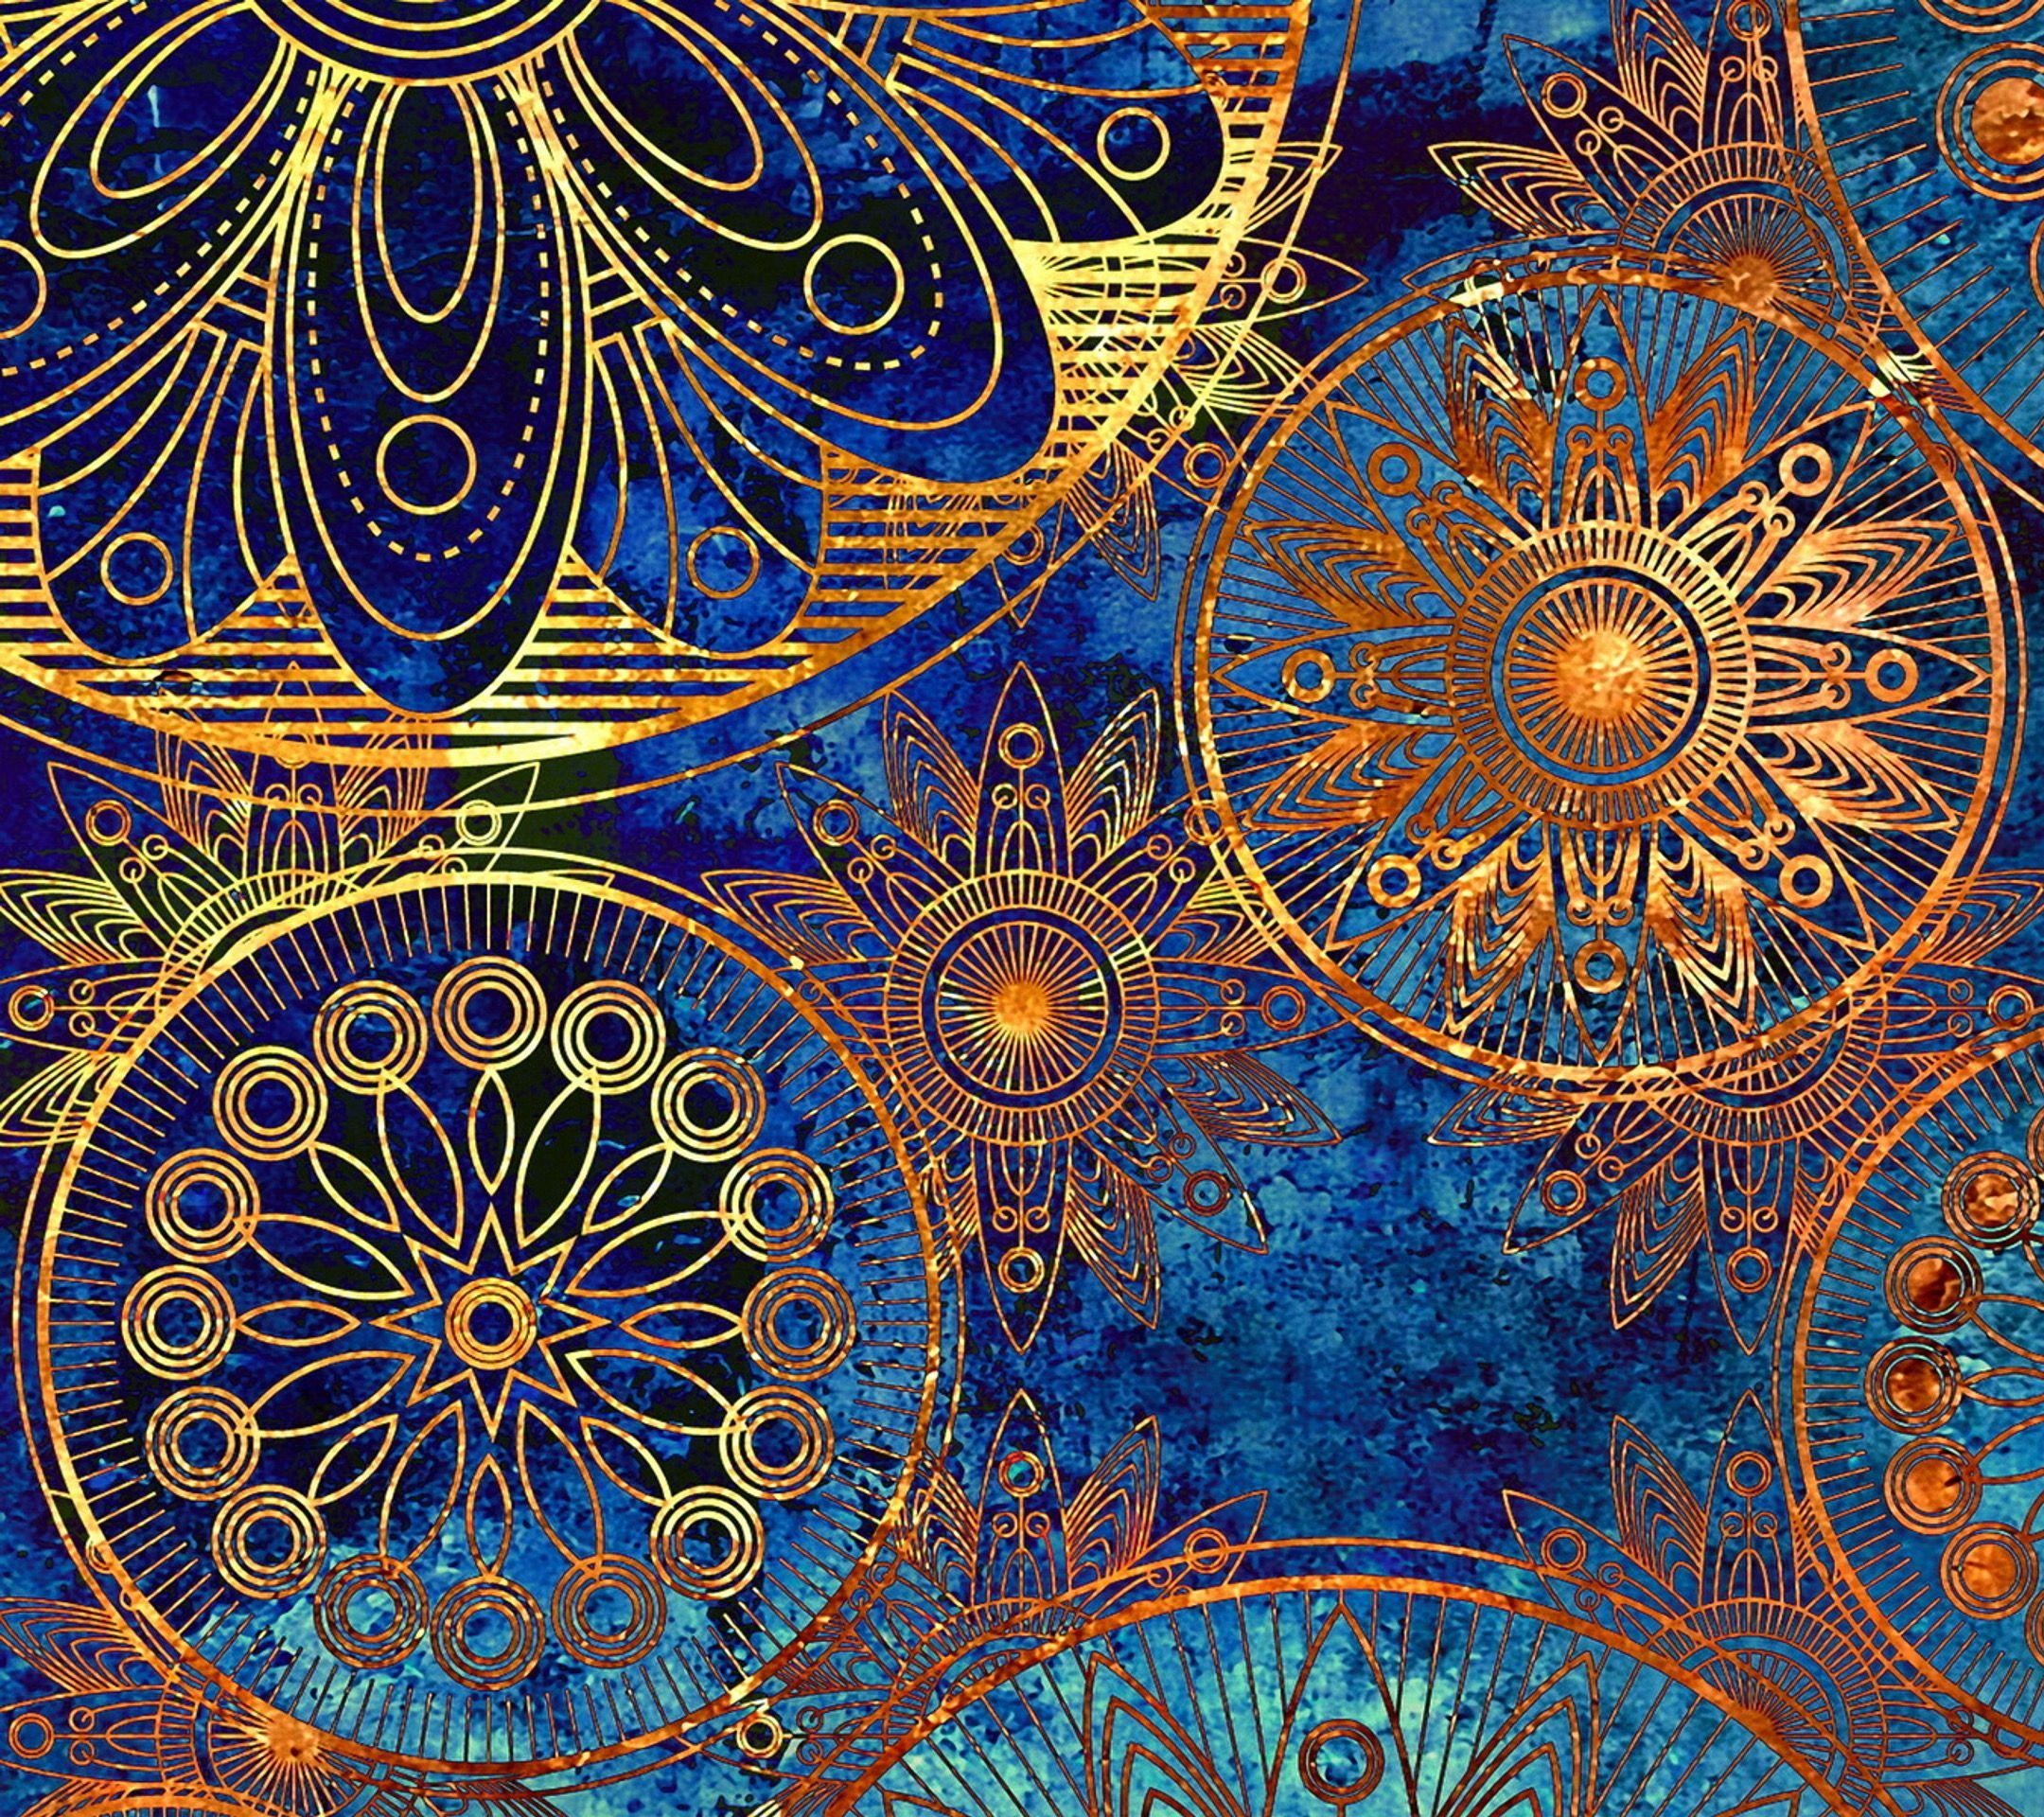 Mandala tap to see more flower pattern wallpapers